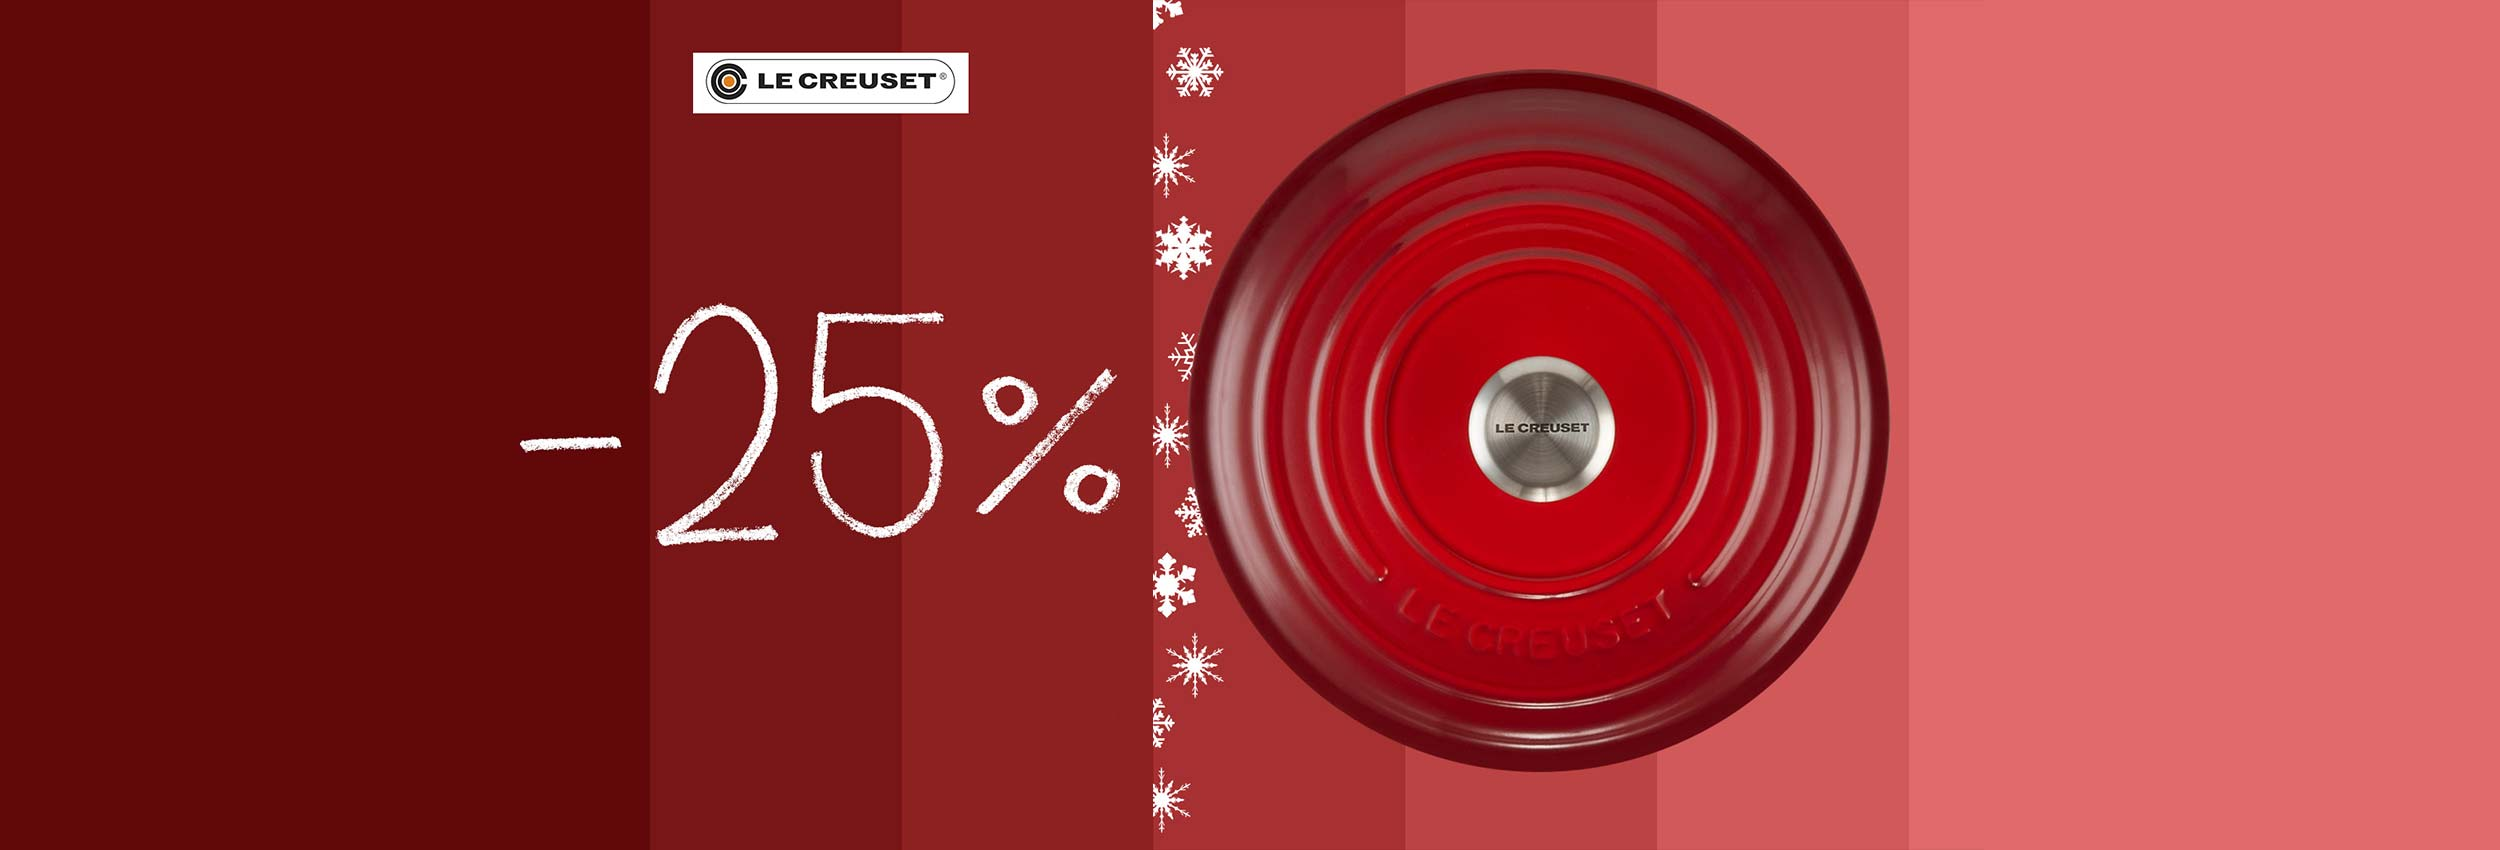 Promo Le Creuset -25%